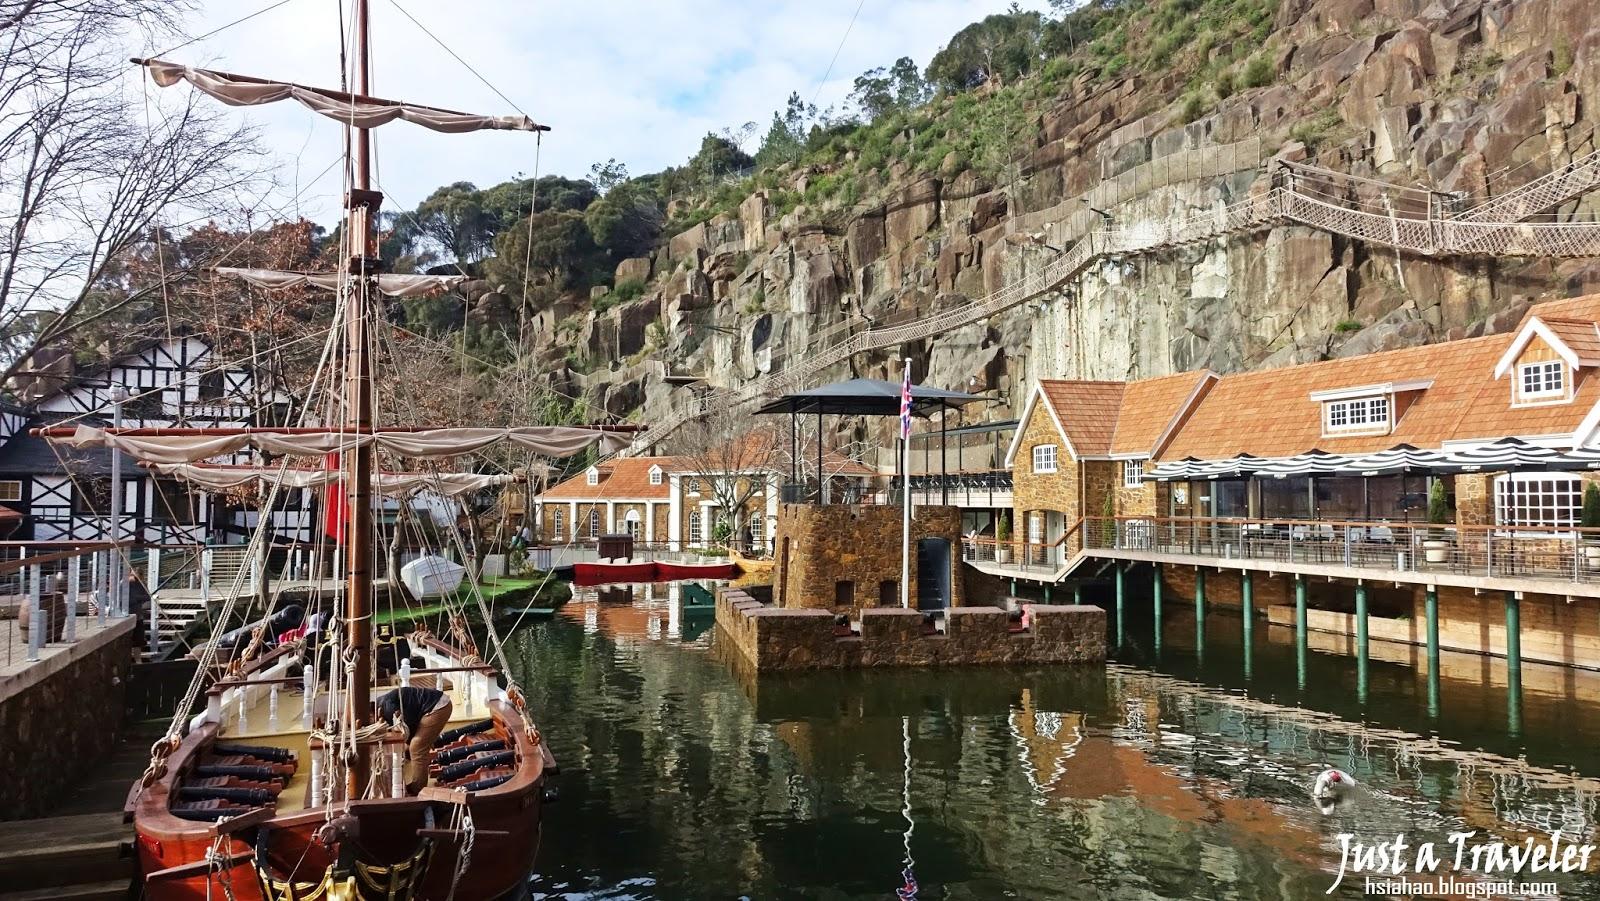 塔斯馬尼亞-Tasmania-景點-美食-交通-遊記-澳洲-自由行-旅遊-travel-attraction-penny